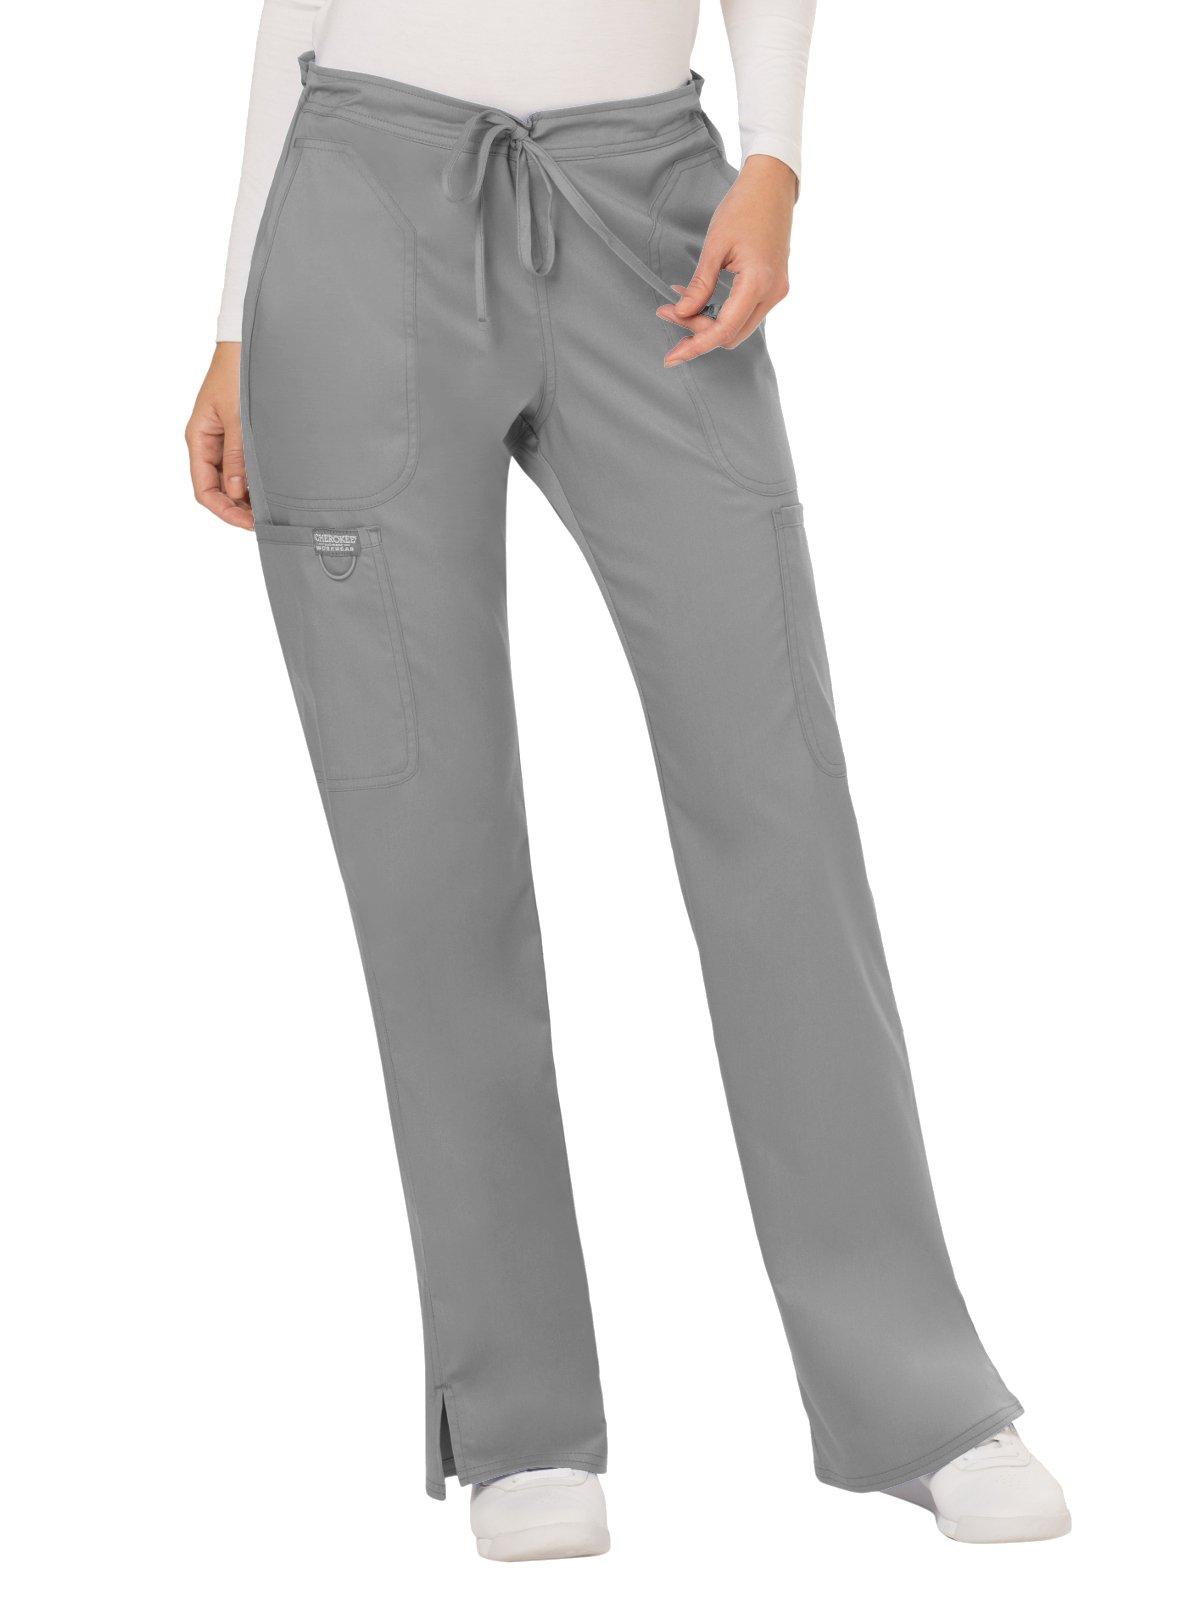 Cherokee WW Revolution WW120 Mid Rise Drawstring Cargo Pant Grey XS Tall